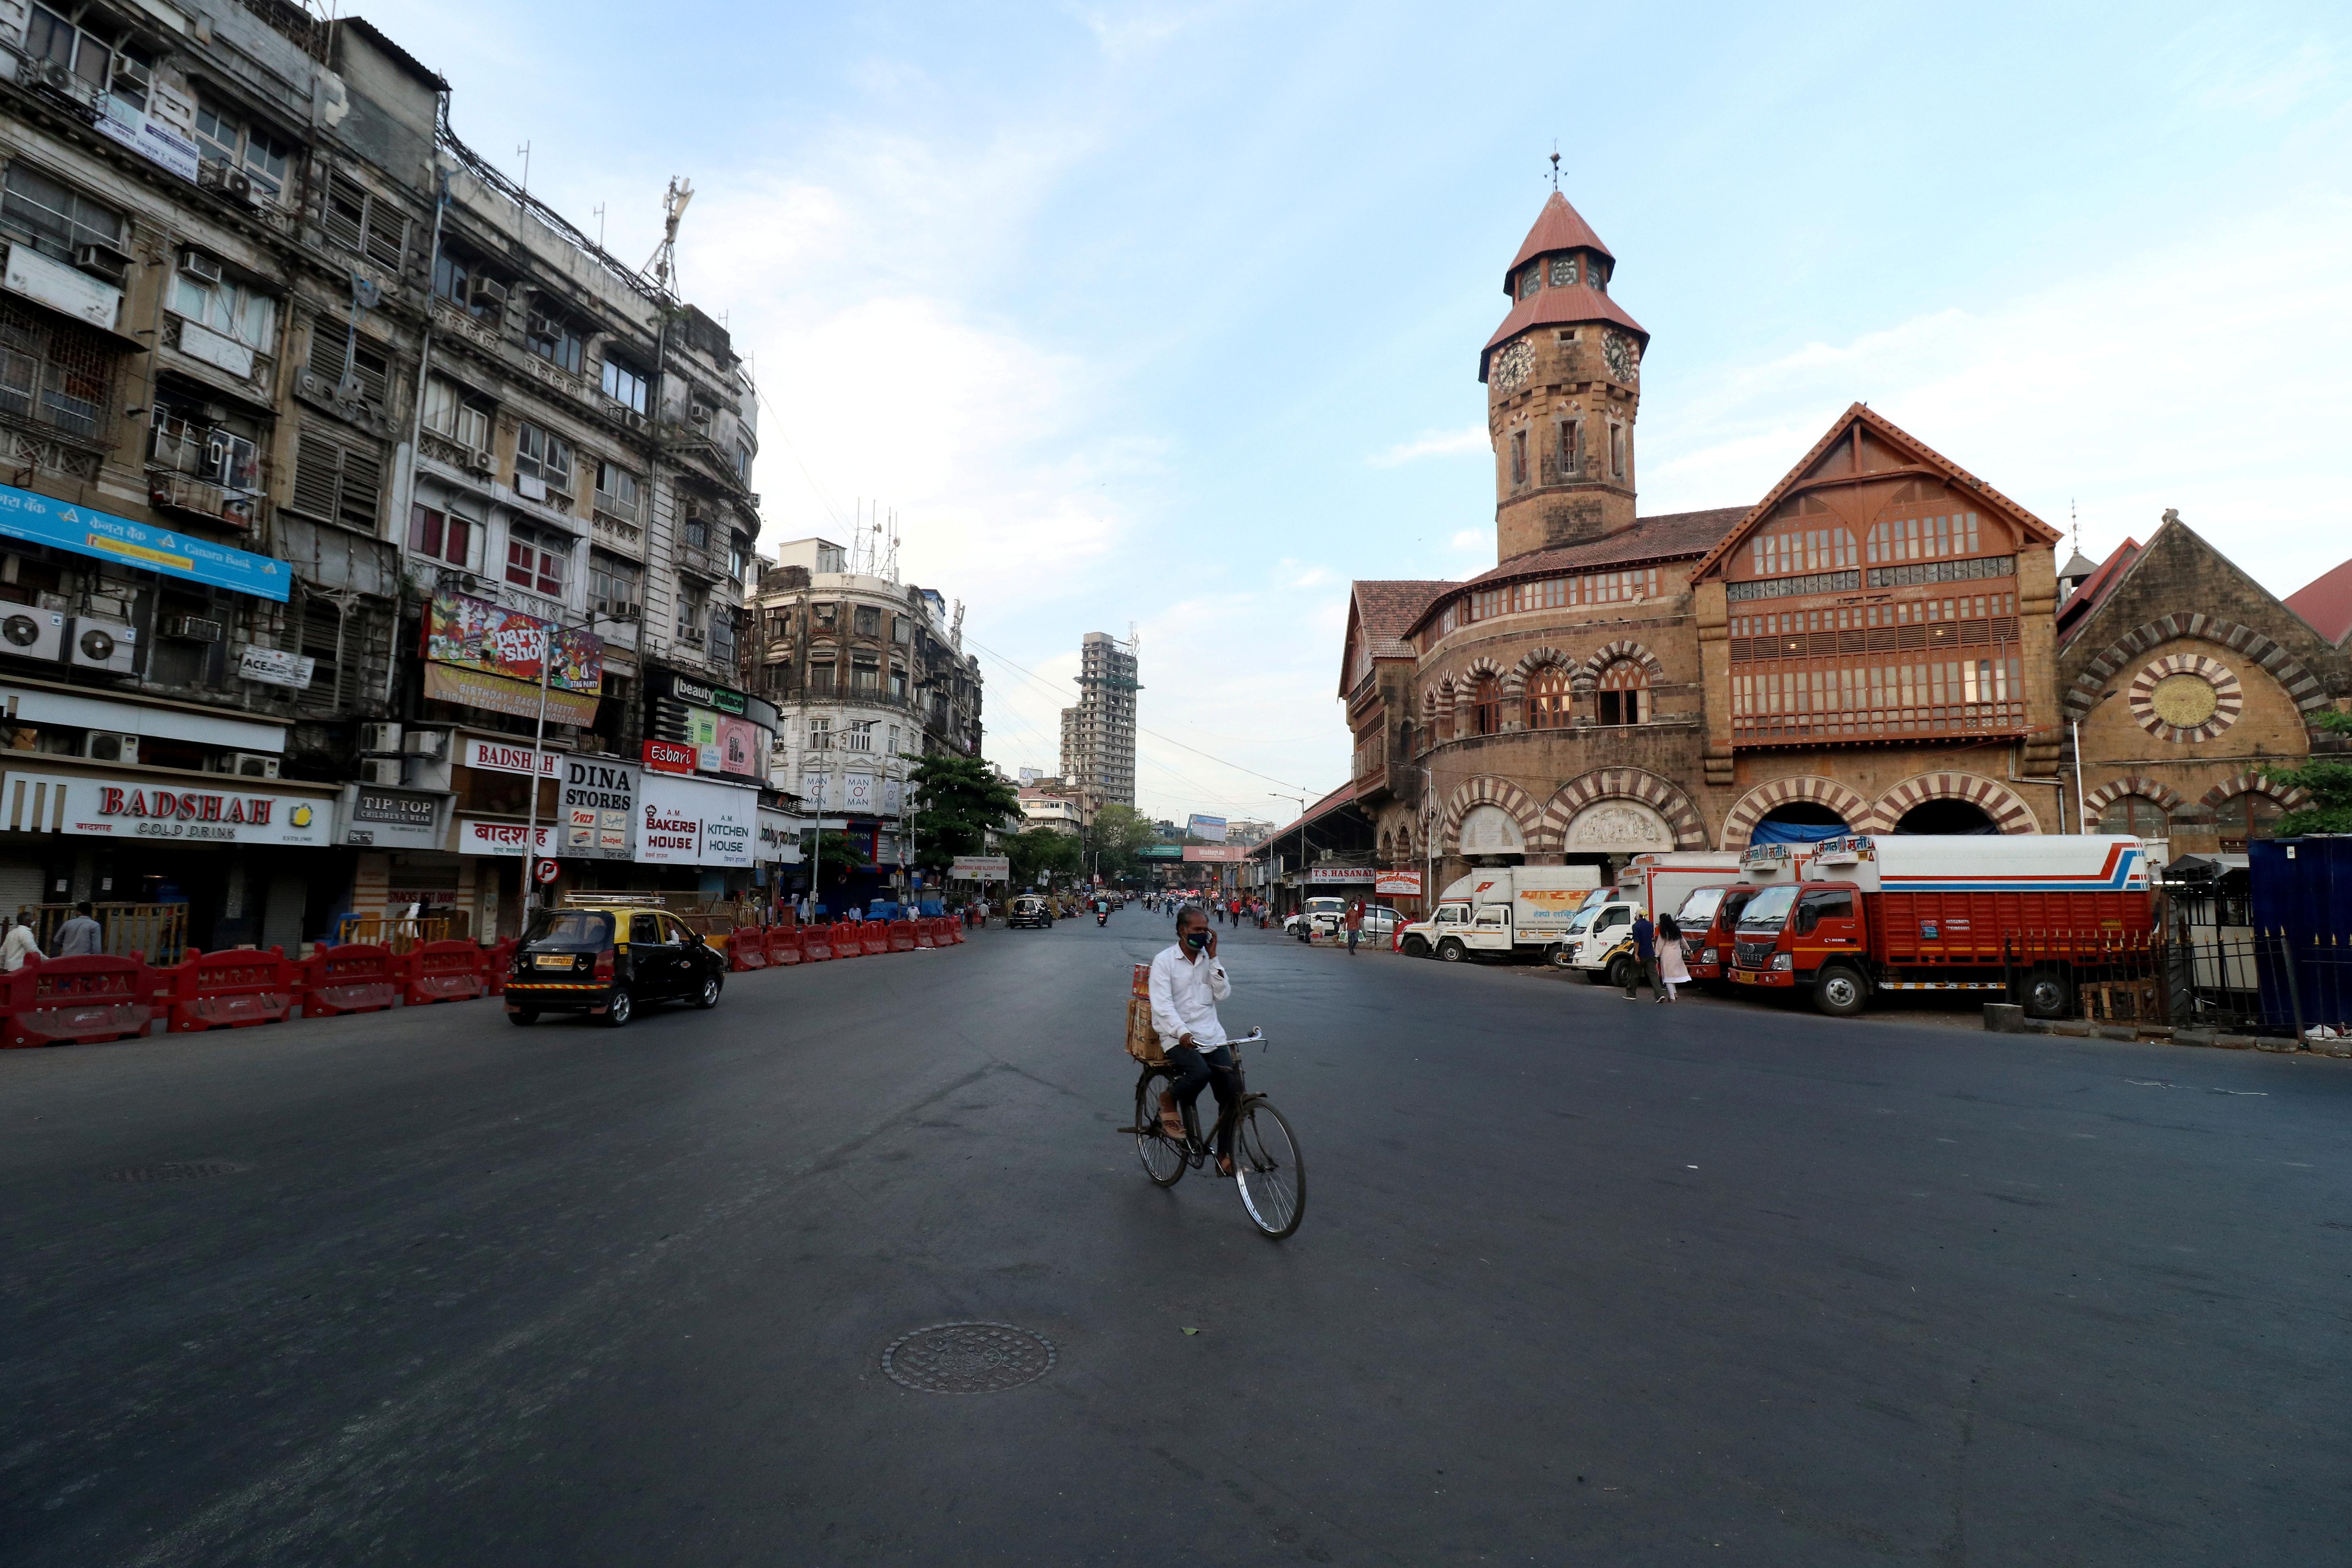 A man rides his bicycle during a lockdown to limit the spread of the coronavirus disease (COVID-19) in Mumbai, India, April 23, 2021. REUTERS/Niharika Kulkarni